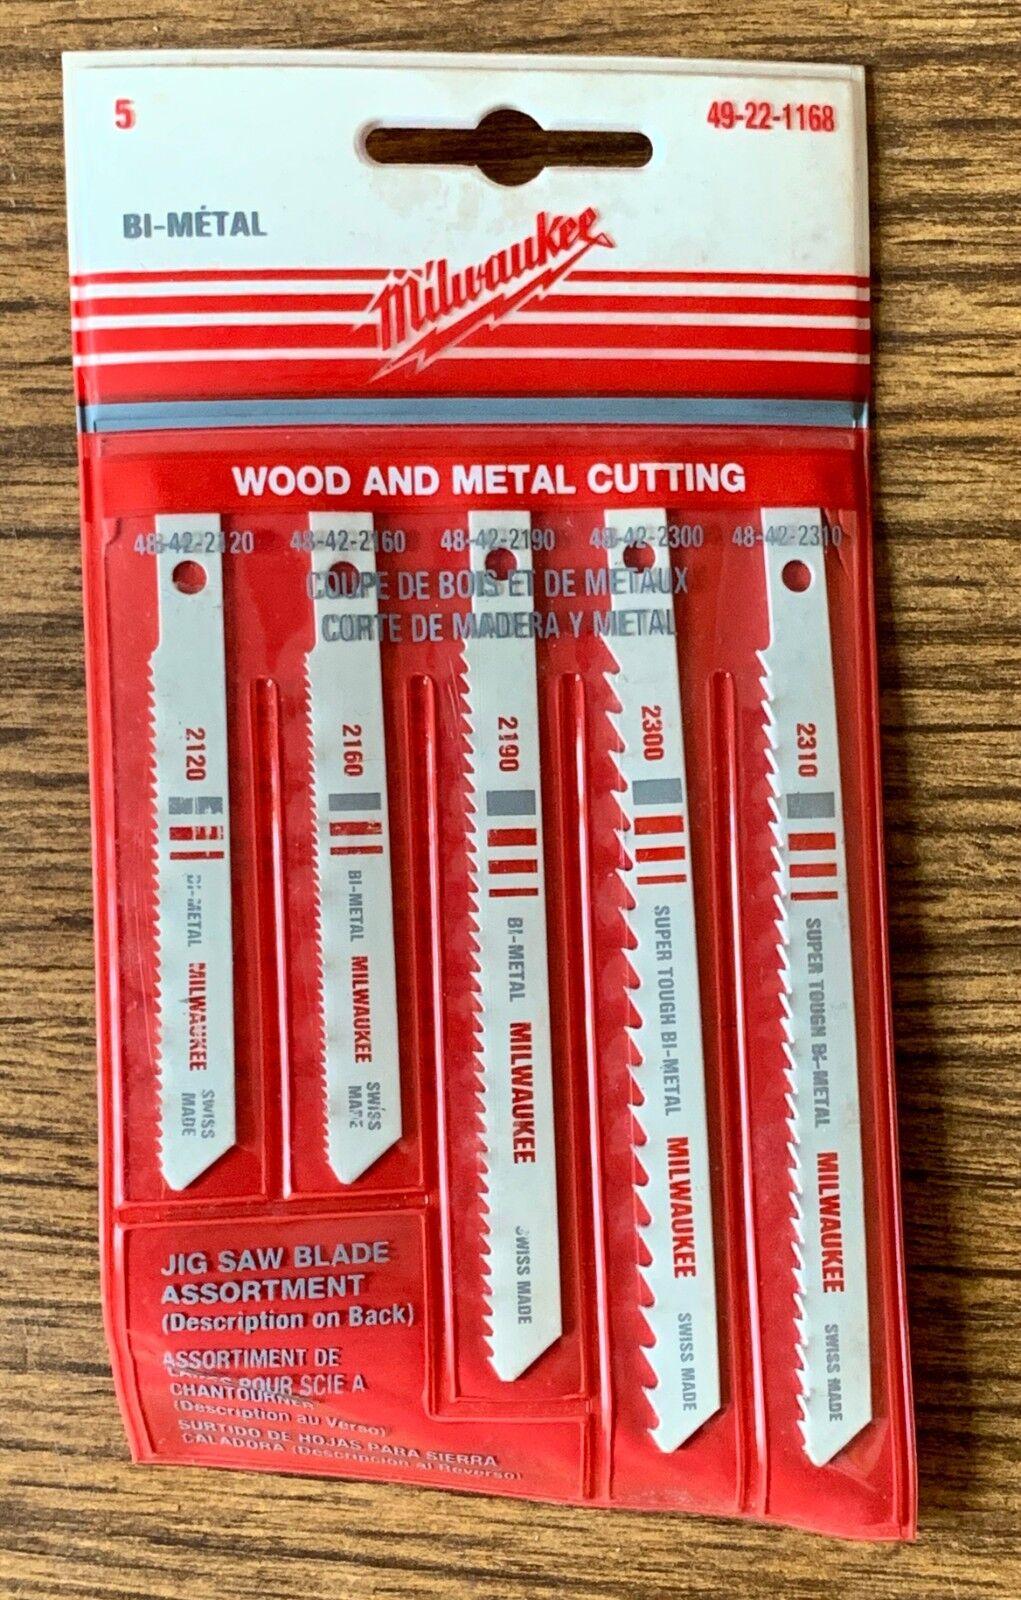 Milwaukee Bi Metal Jig Saw Blades Wood and Metal Cutting 49 22 1168 Pack of 5